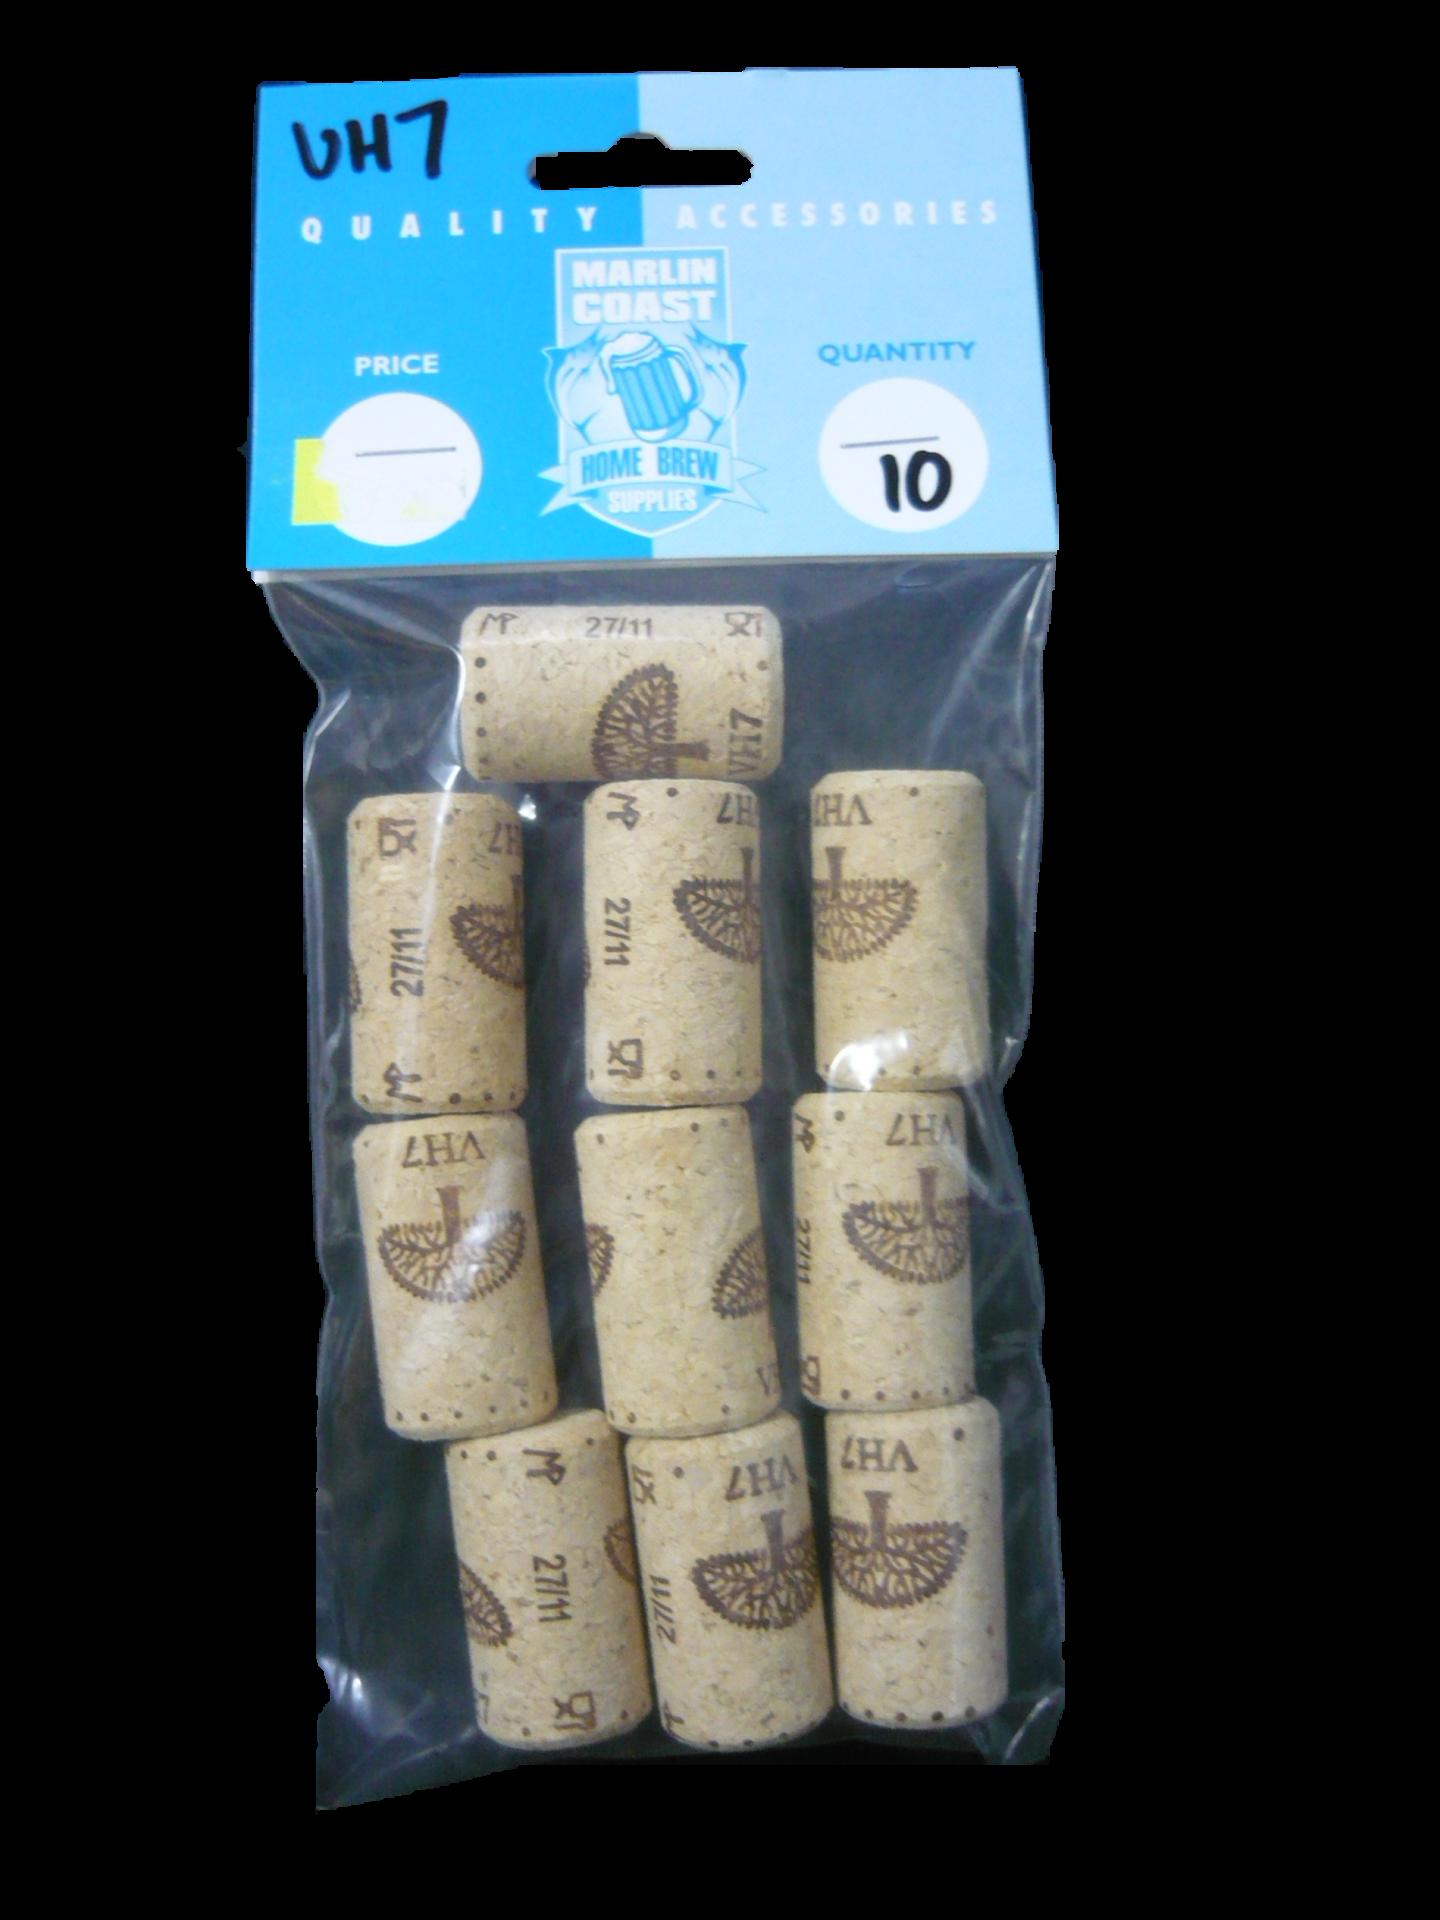 VH7 Wine Corks (pack of 10)